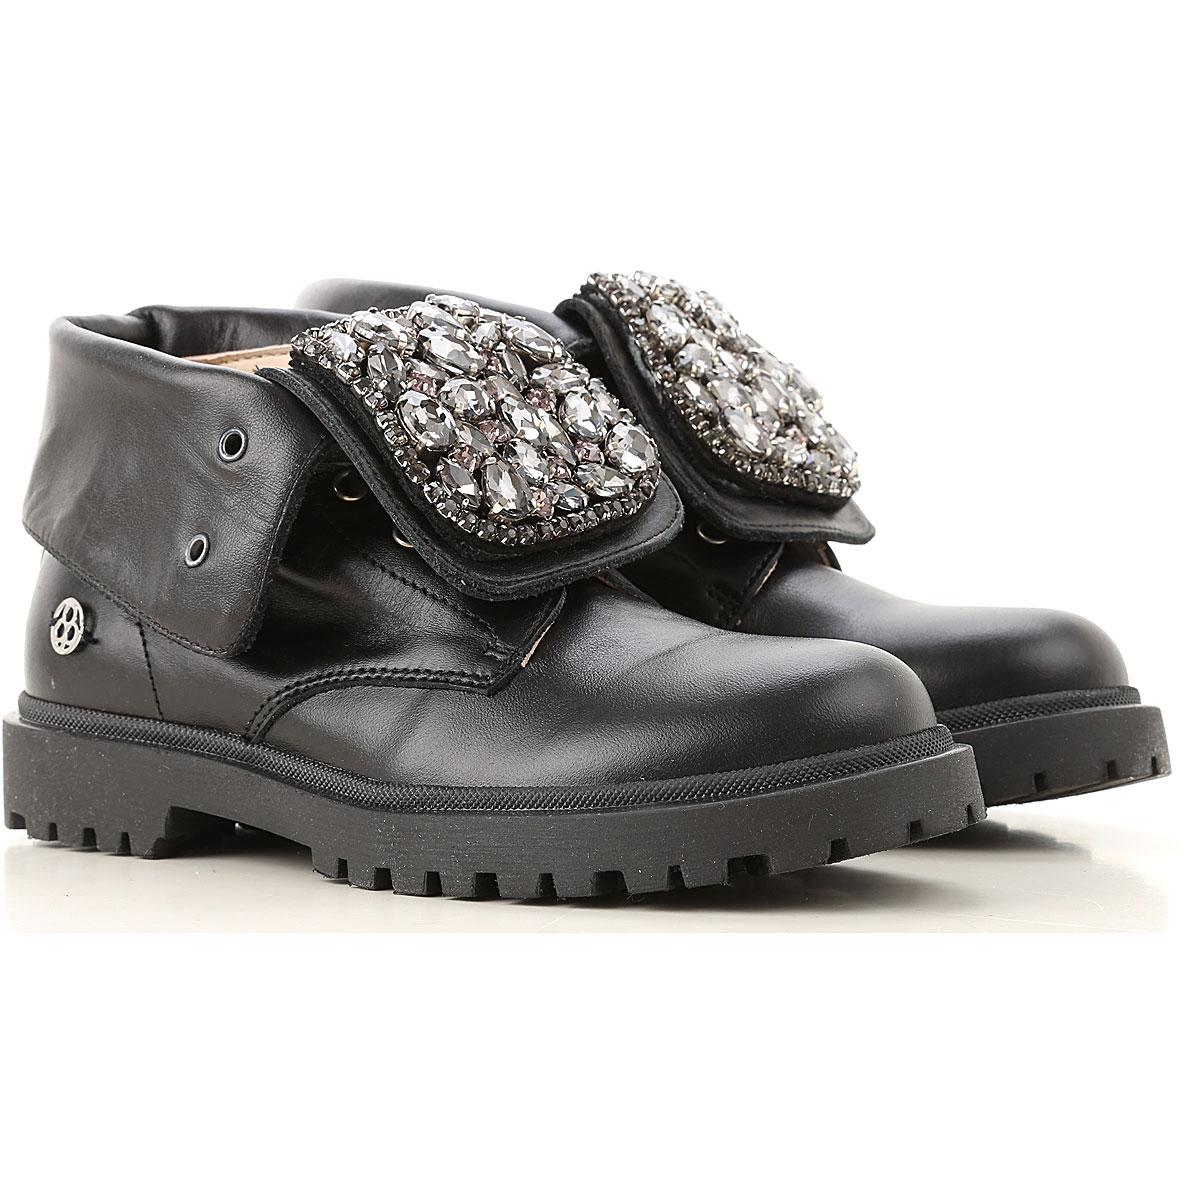 Florens Kids Shoes for Girls On Sale, Calf Black, Rubber, 2019, 20 21 22 23 24 25 26 27 28 29